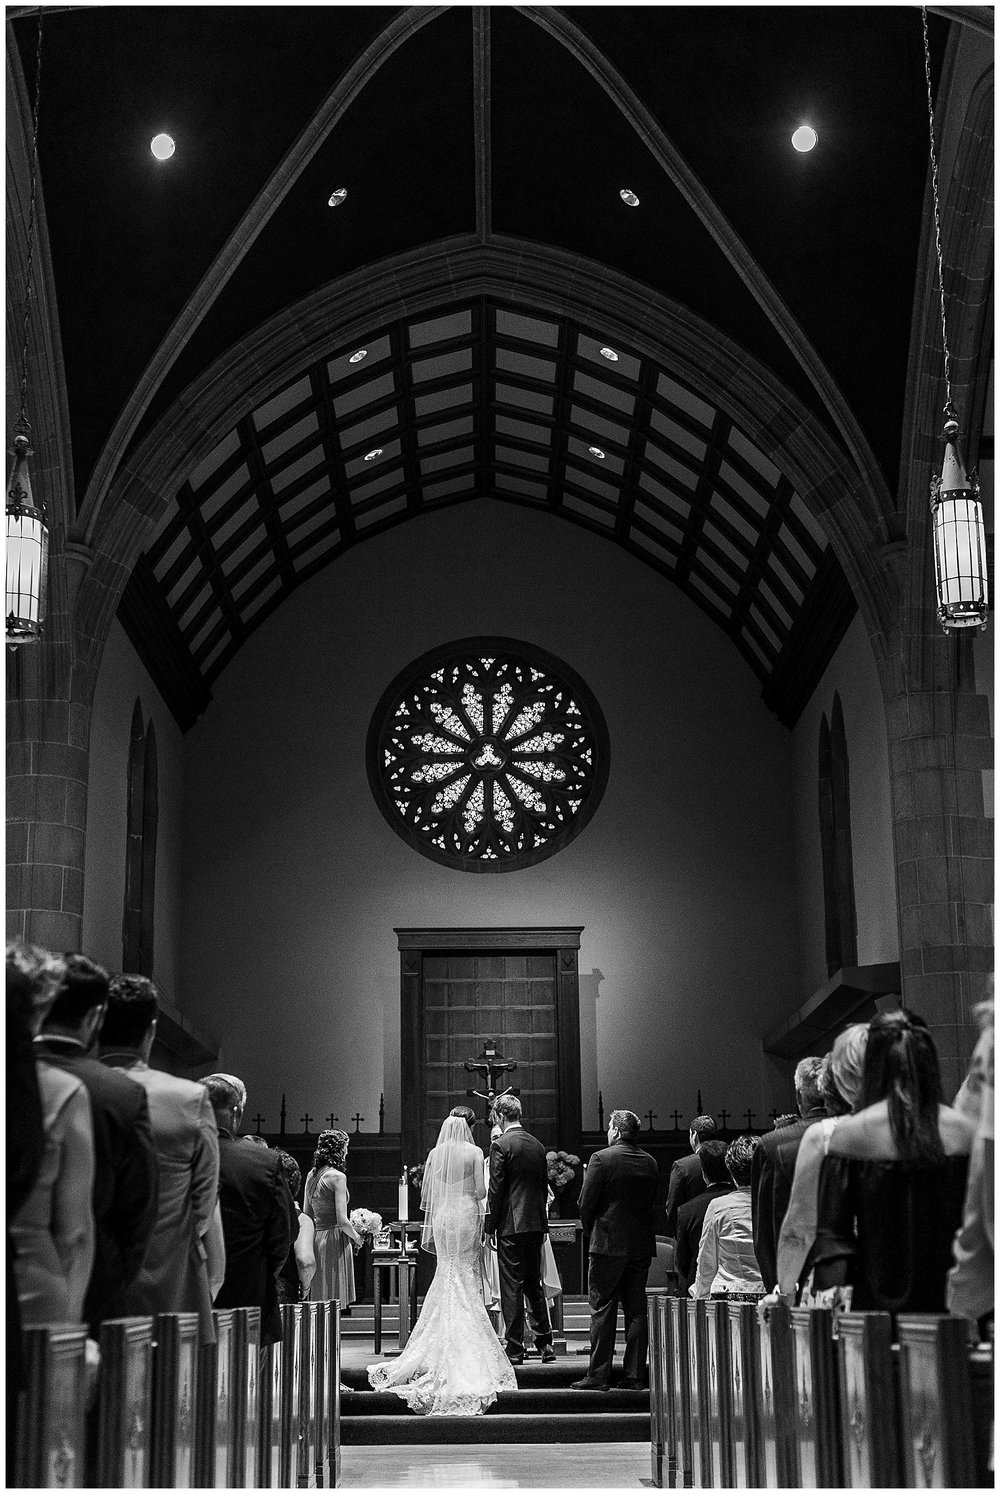 TracyPatrick-LoyolaCollege-PrestonHall-Wedding-LivingRadiantPhotography-photos_0047.jpg